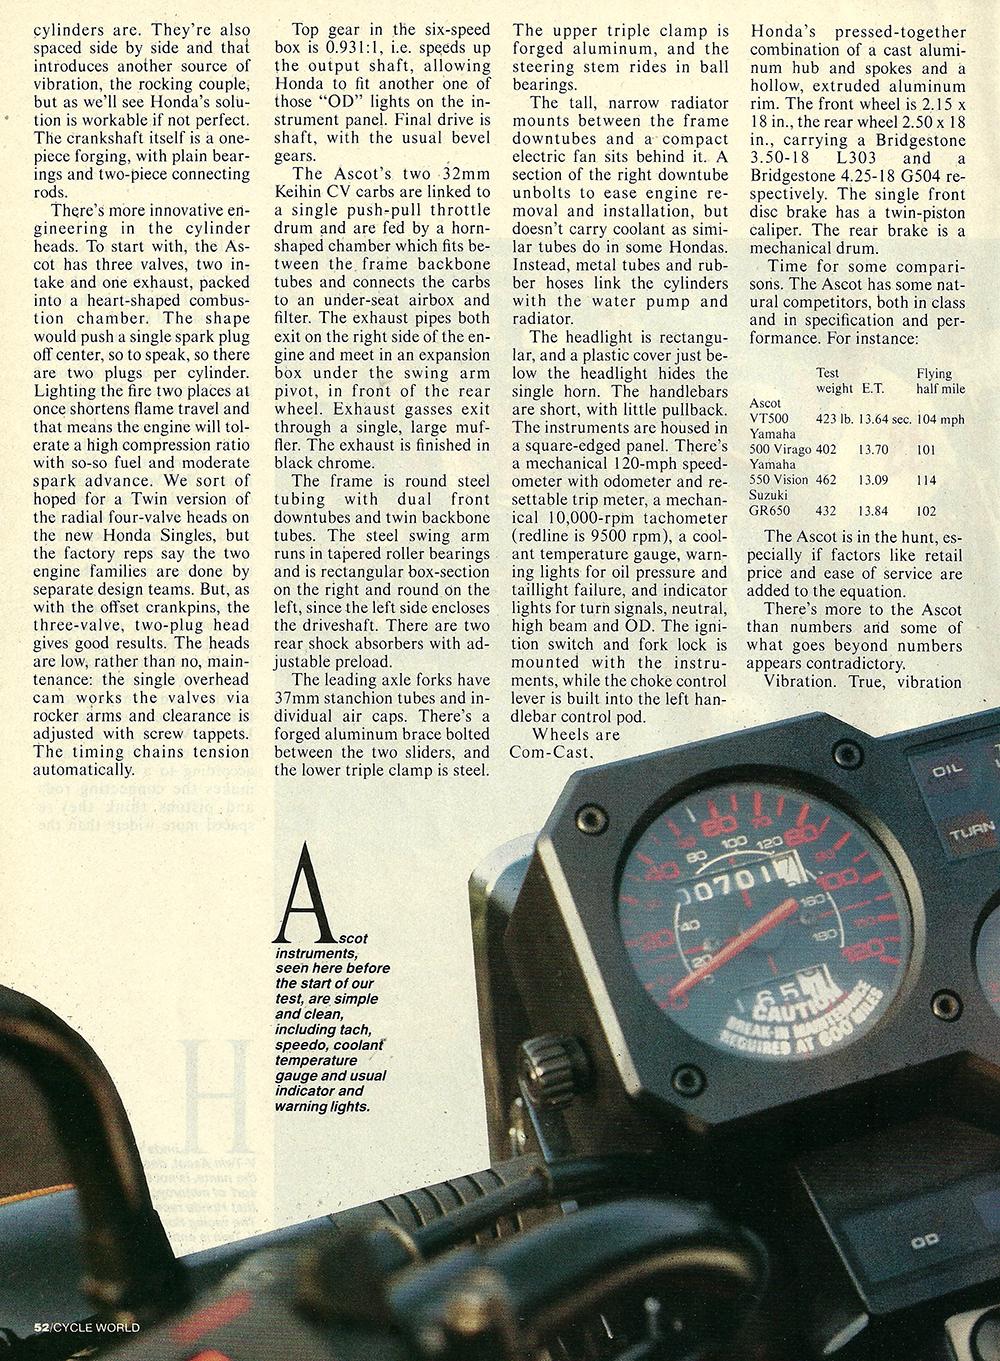 1983 Honda VT500 Ascot road test 2 03.JPG